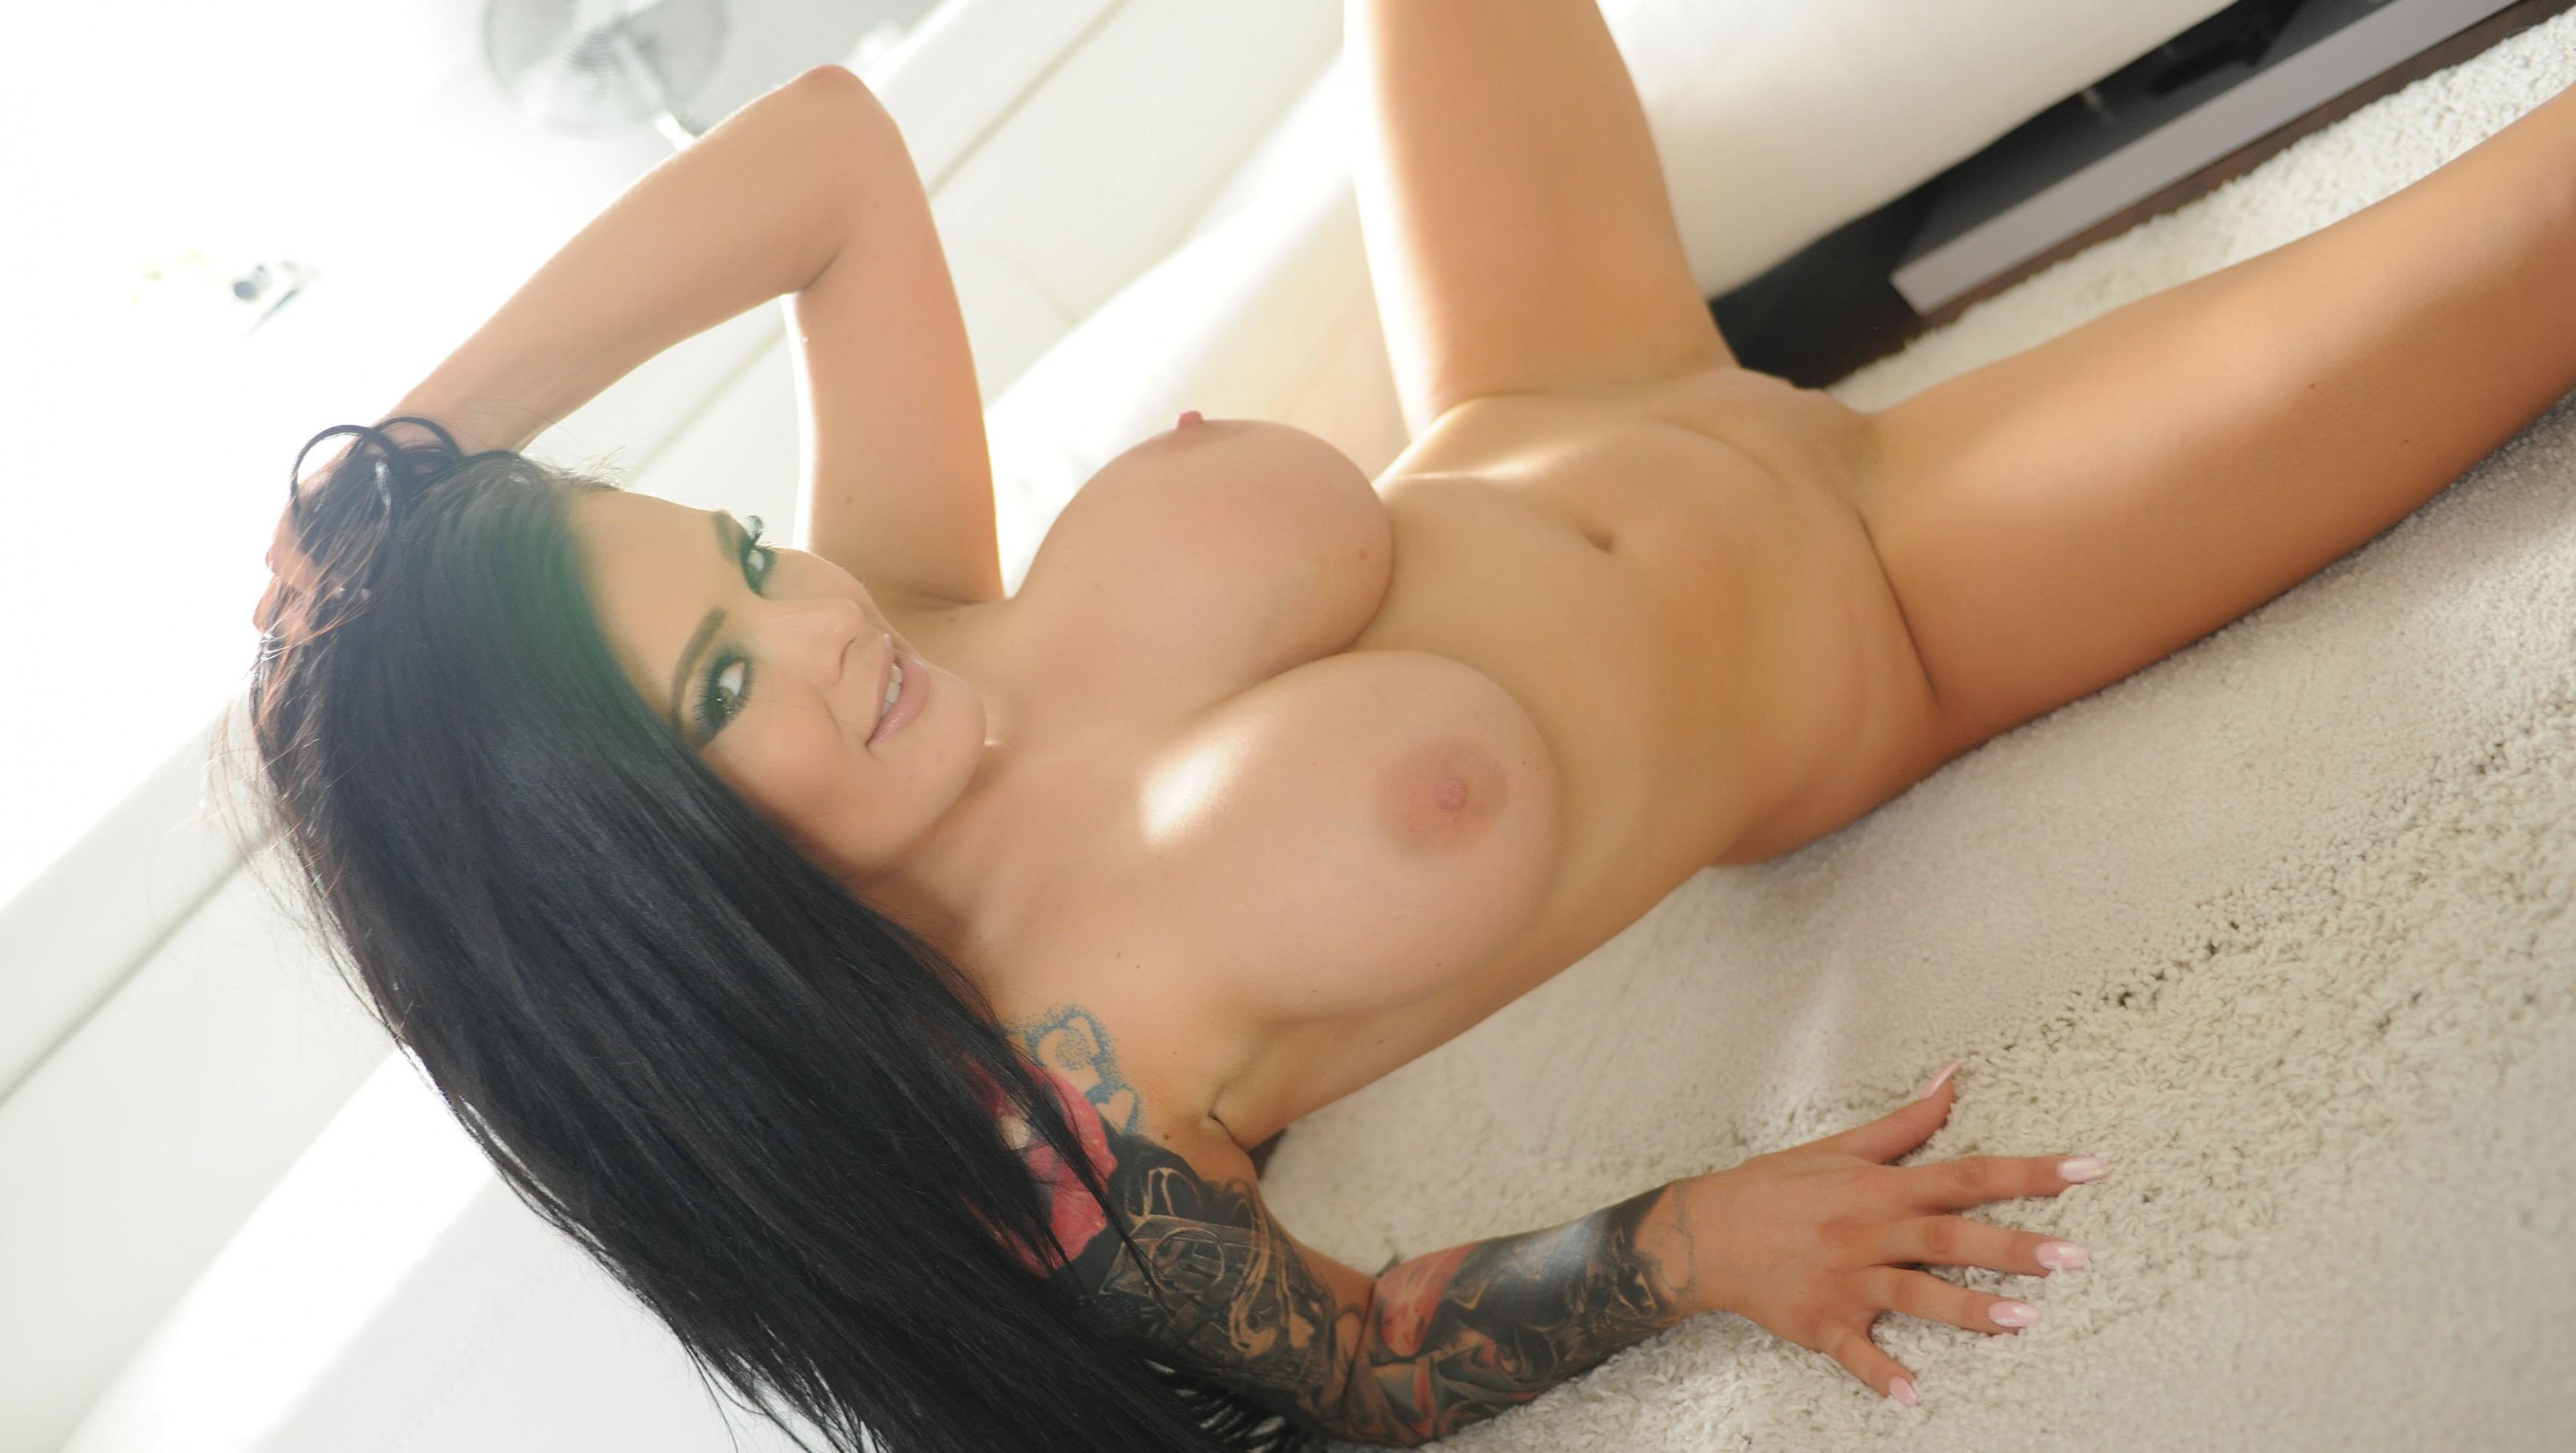 charley atwell nude